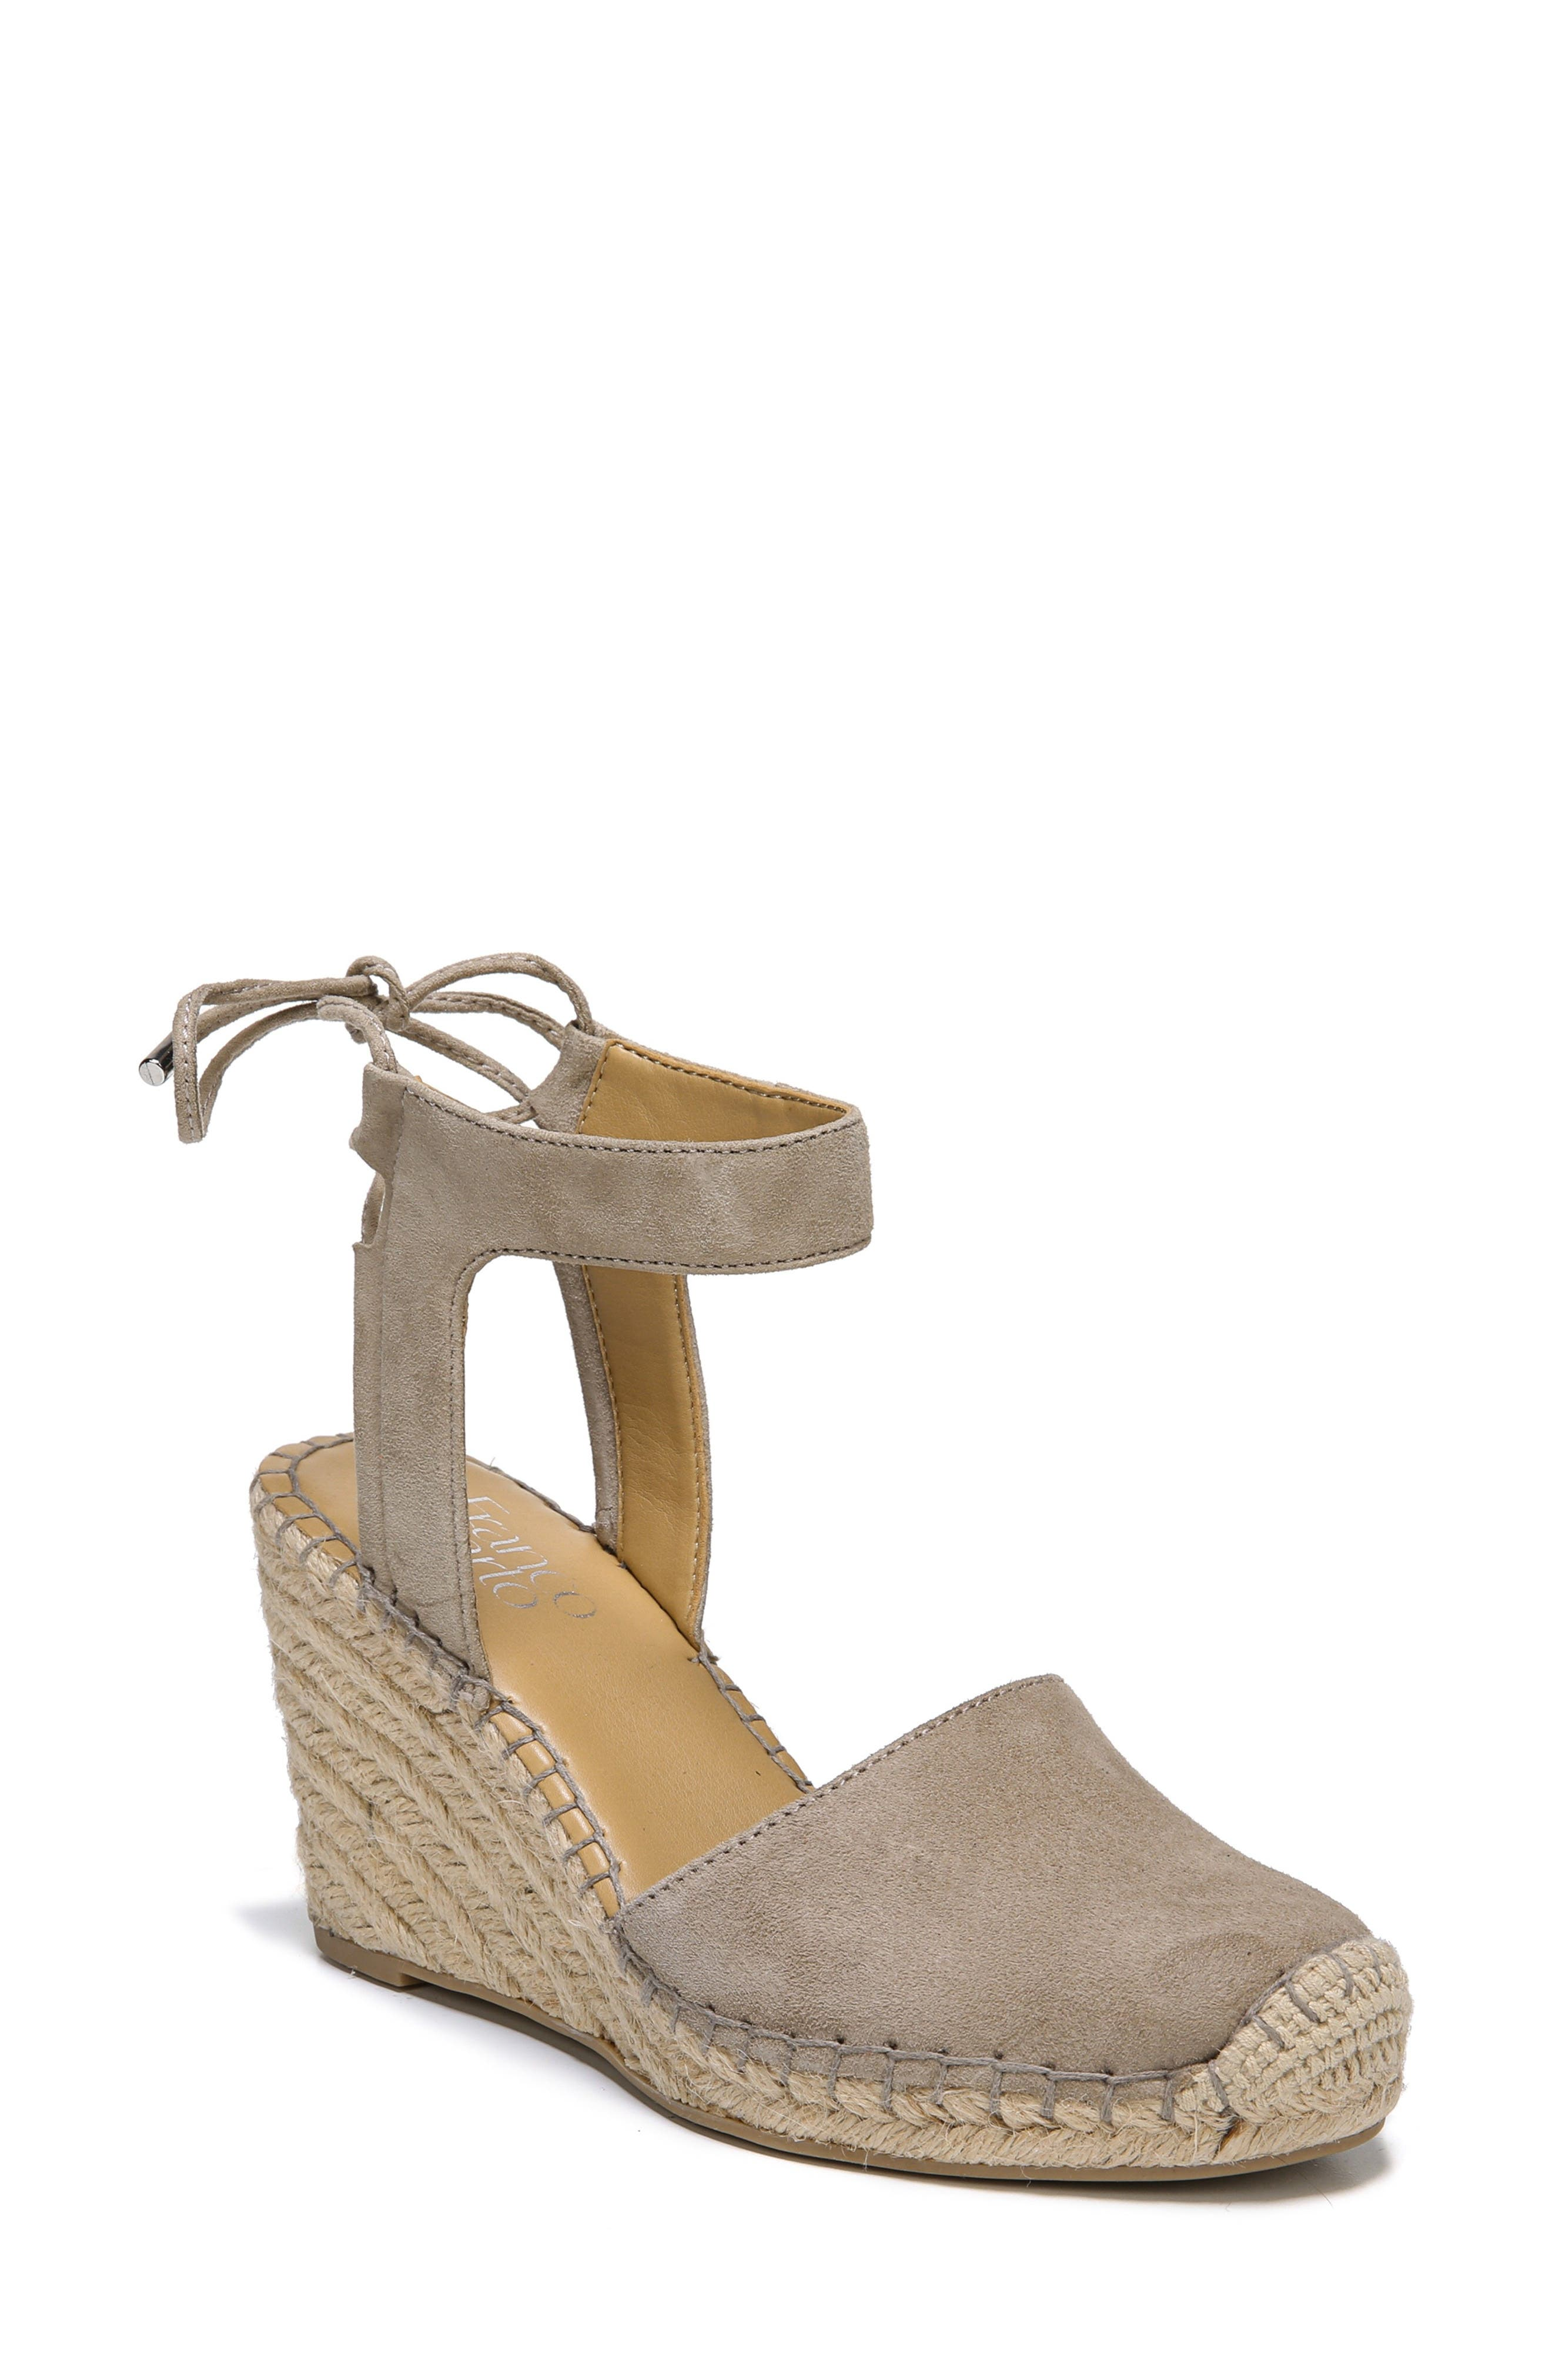 Mariska Espadrille Wedge Sandal,                         Main,                         color, Satin Taupe Suede